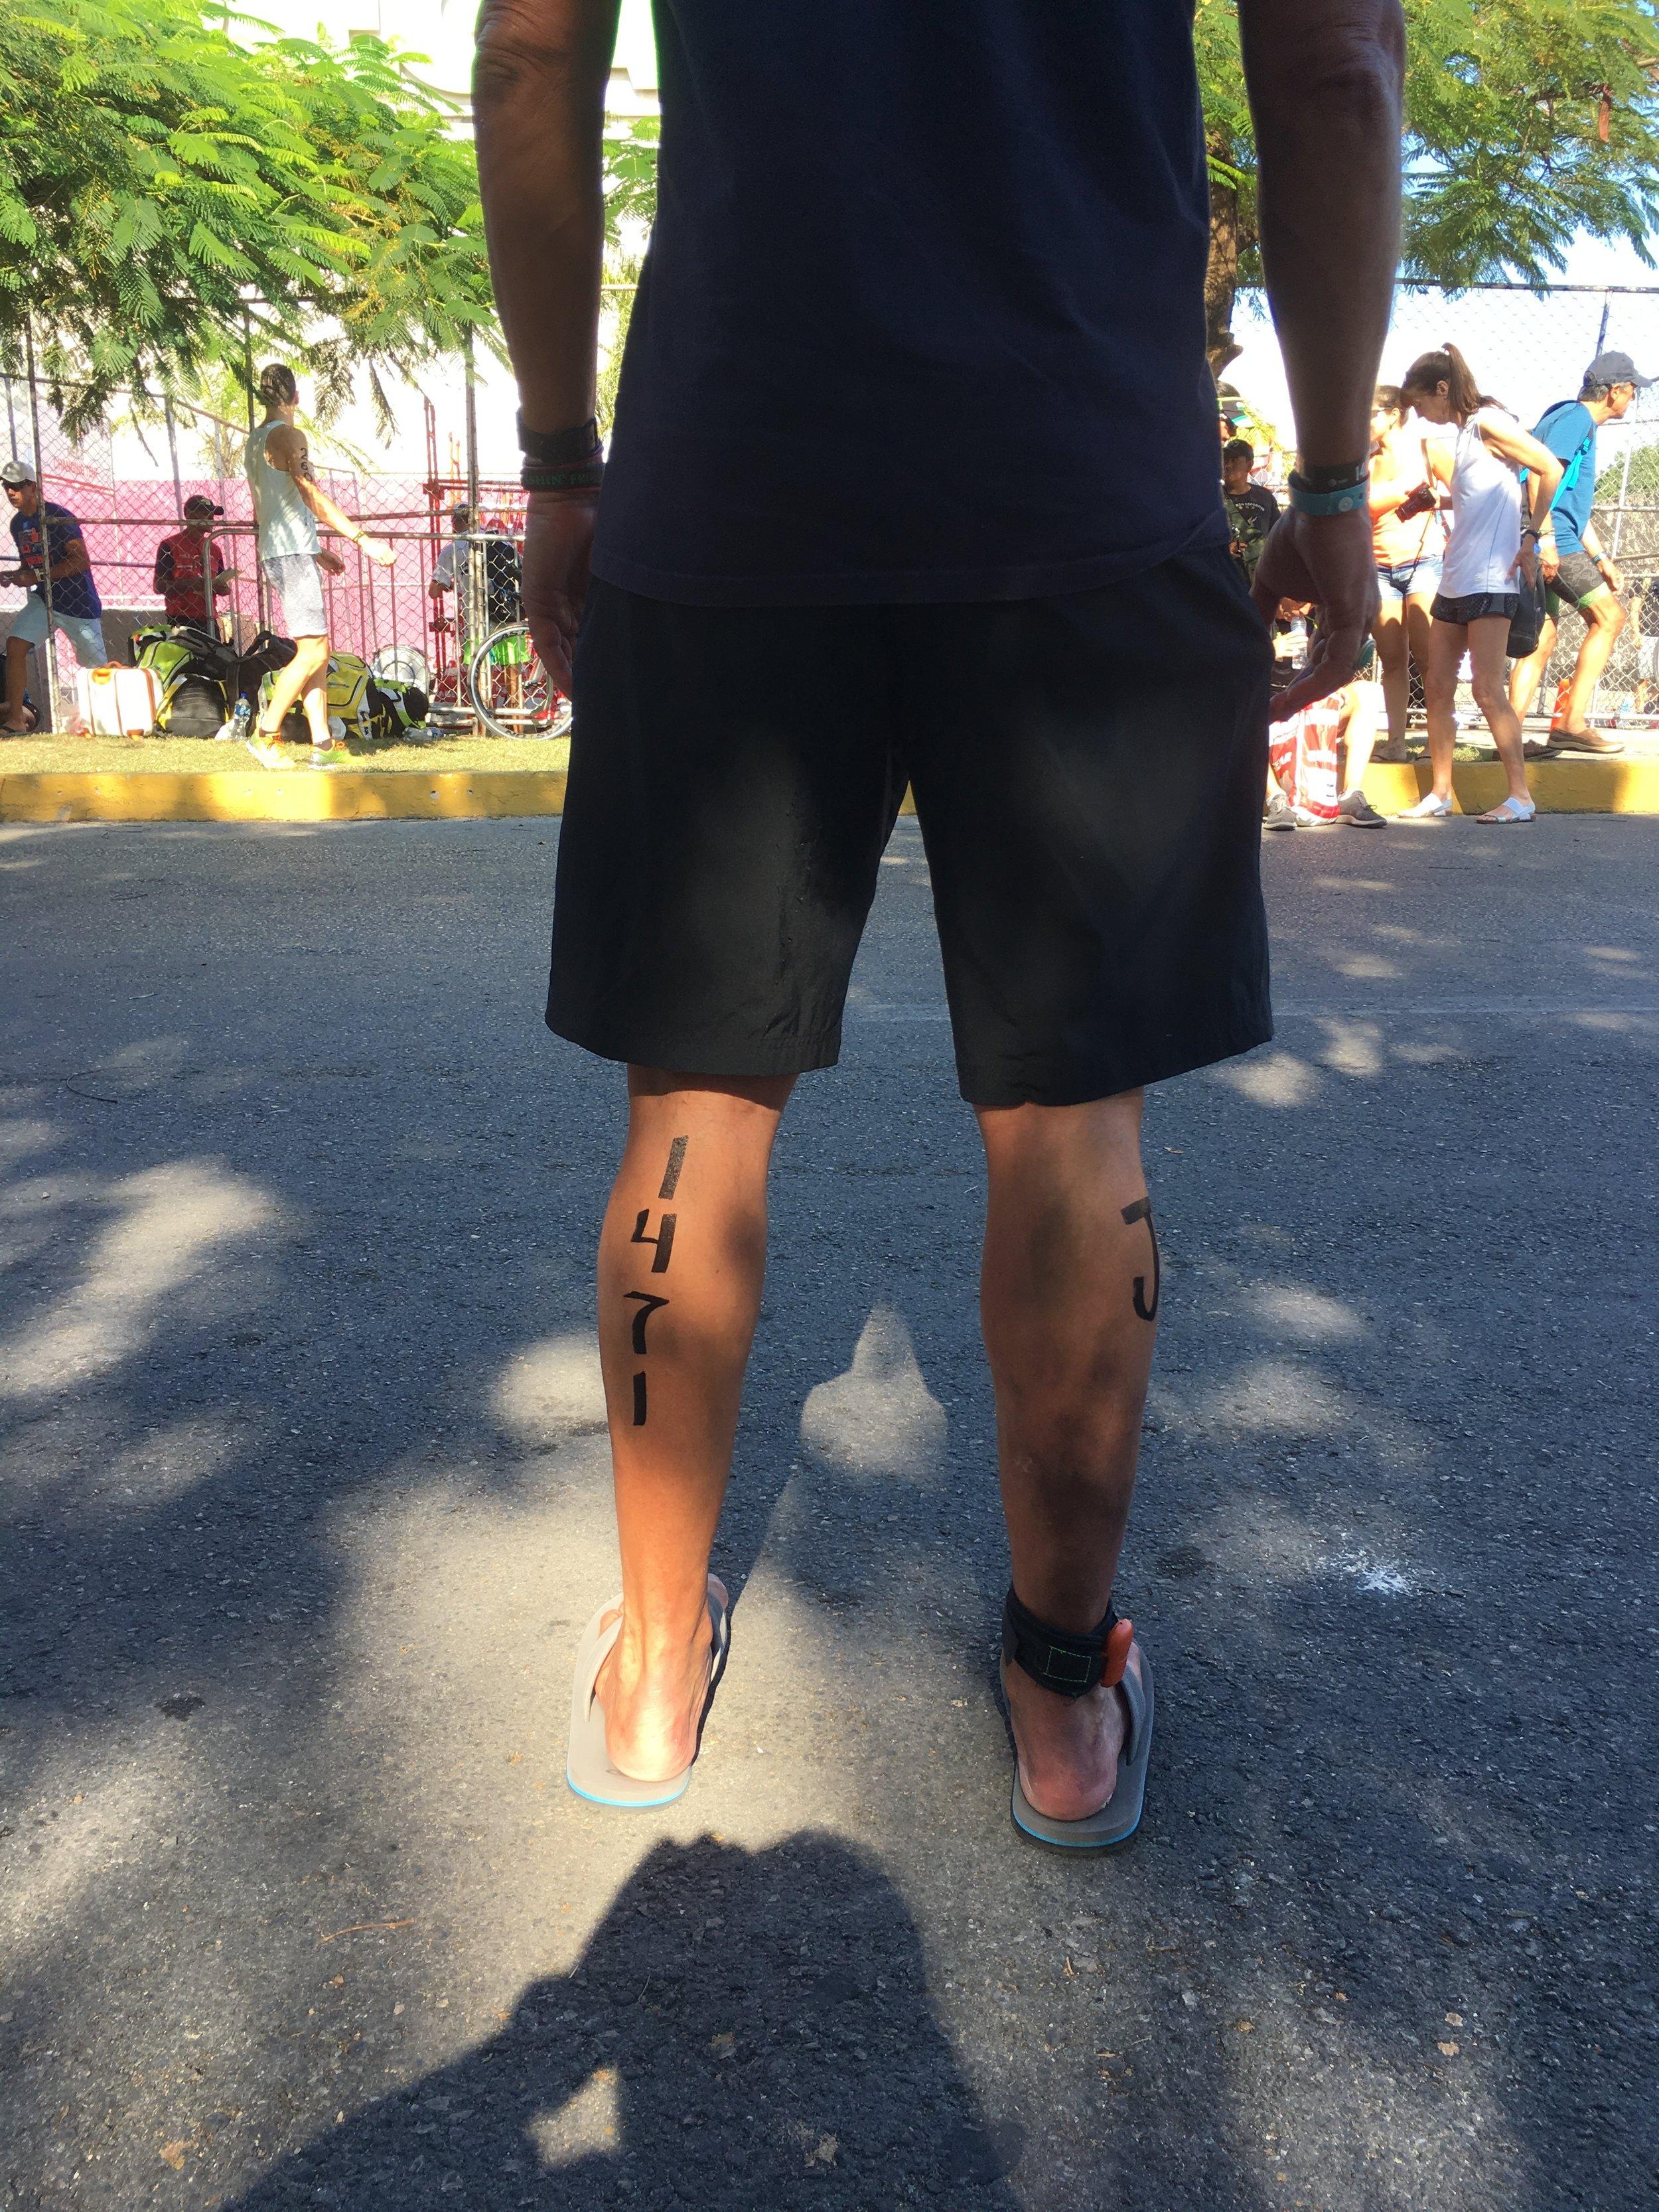 2018 Ironman Mexico